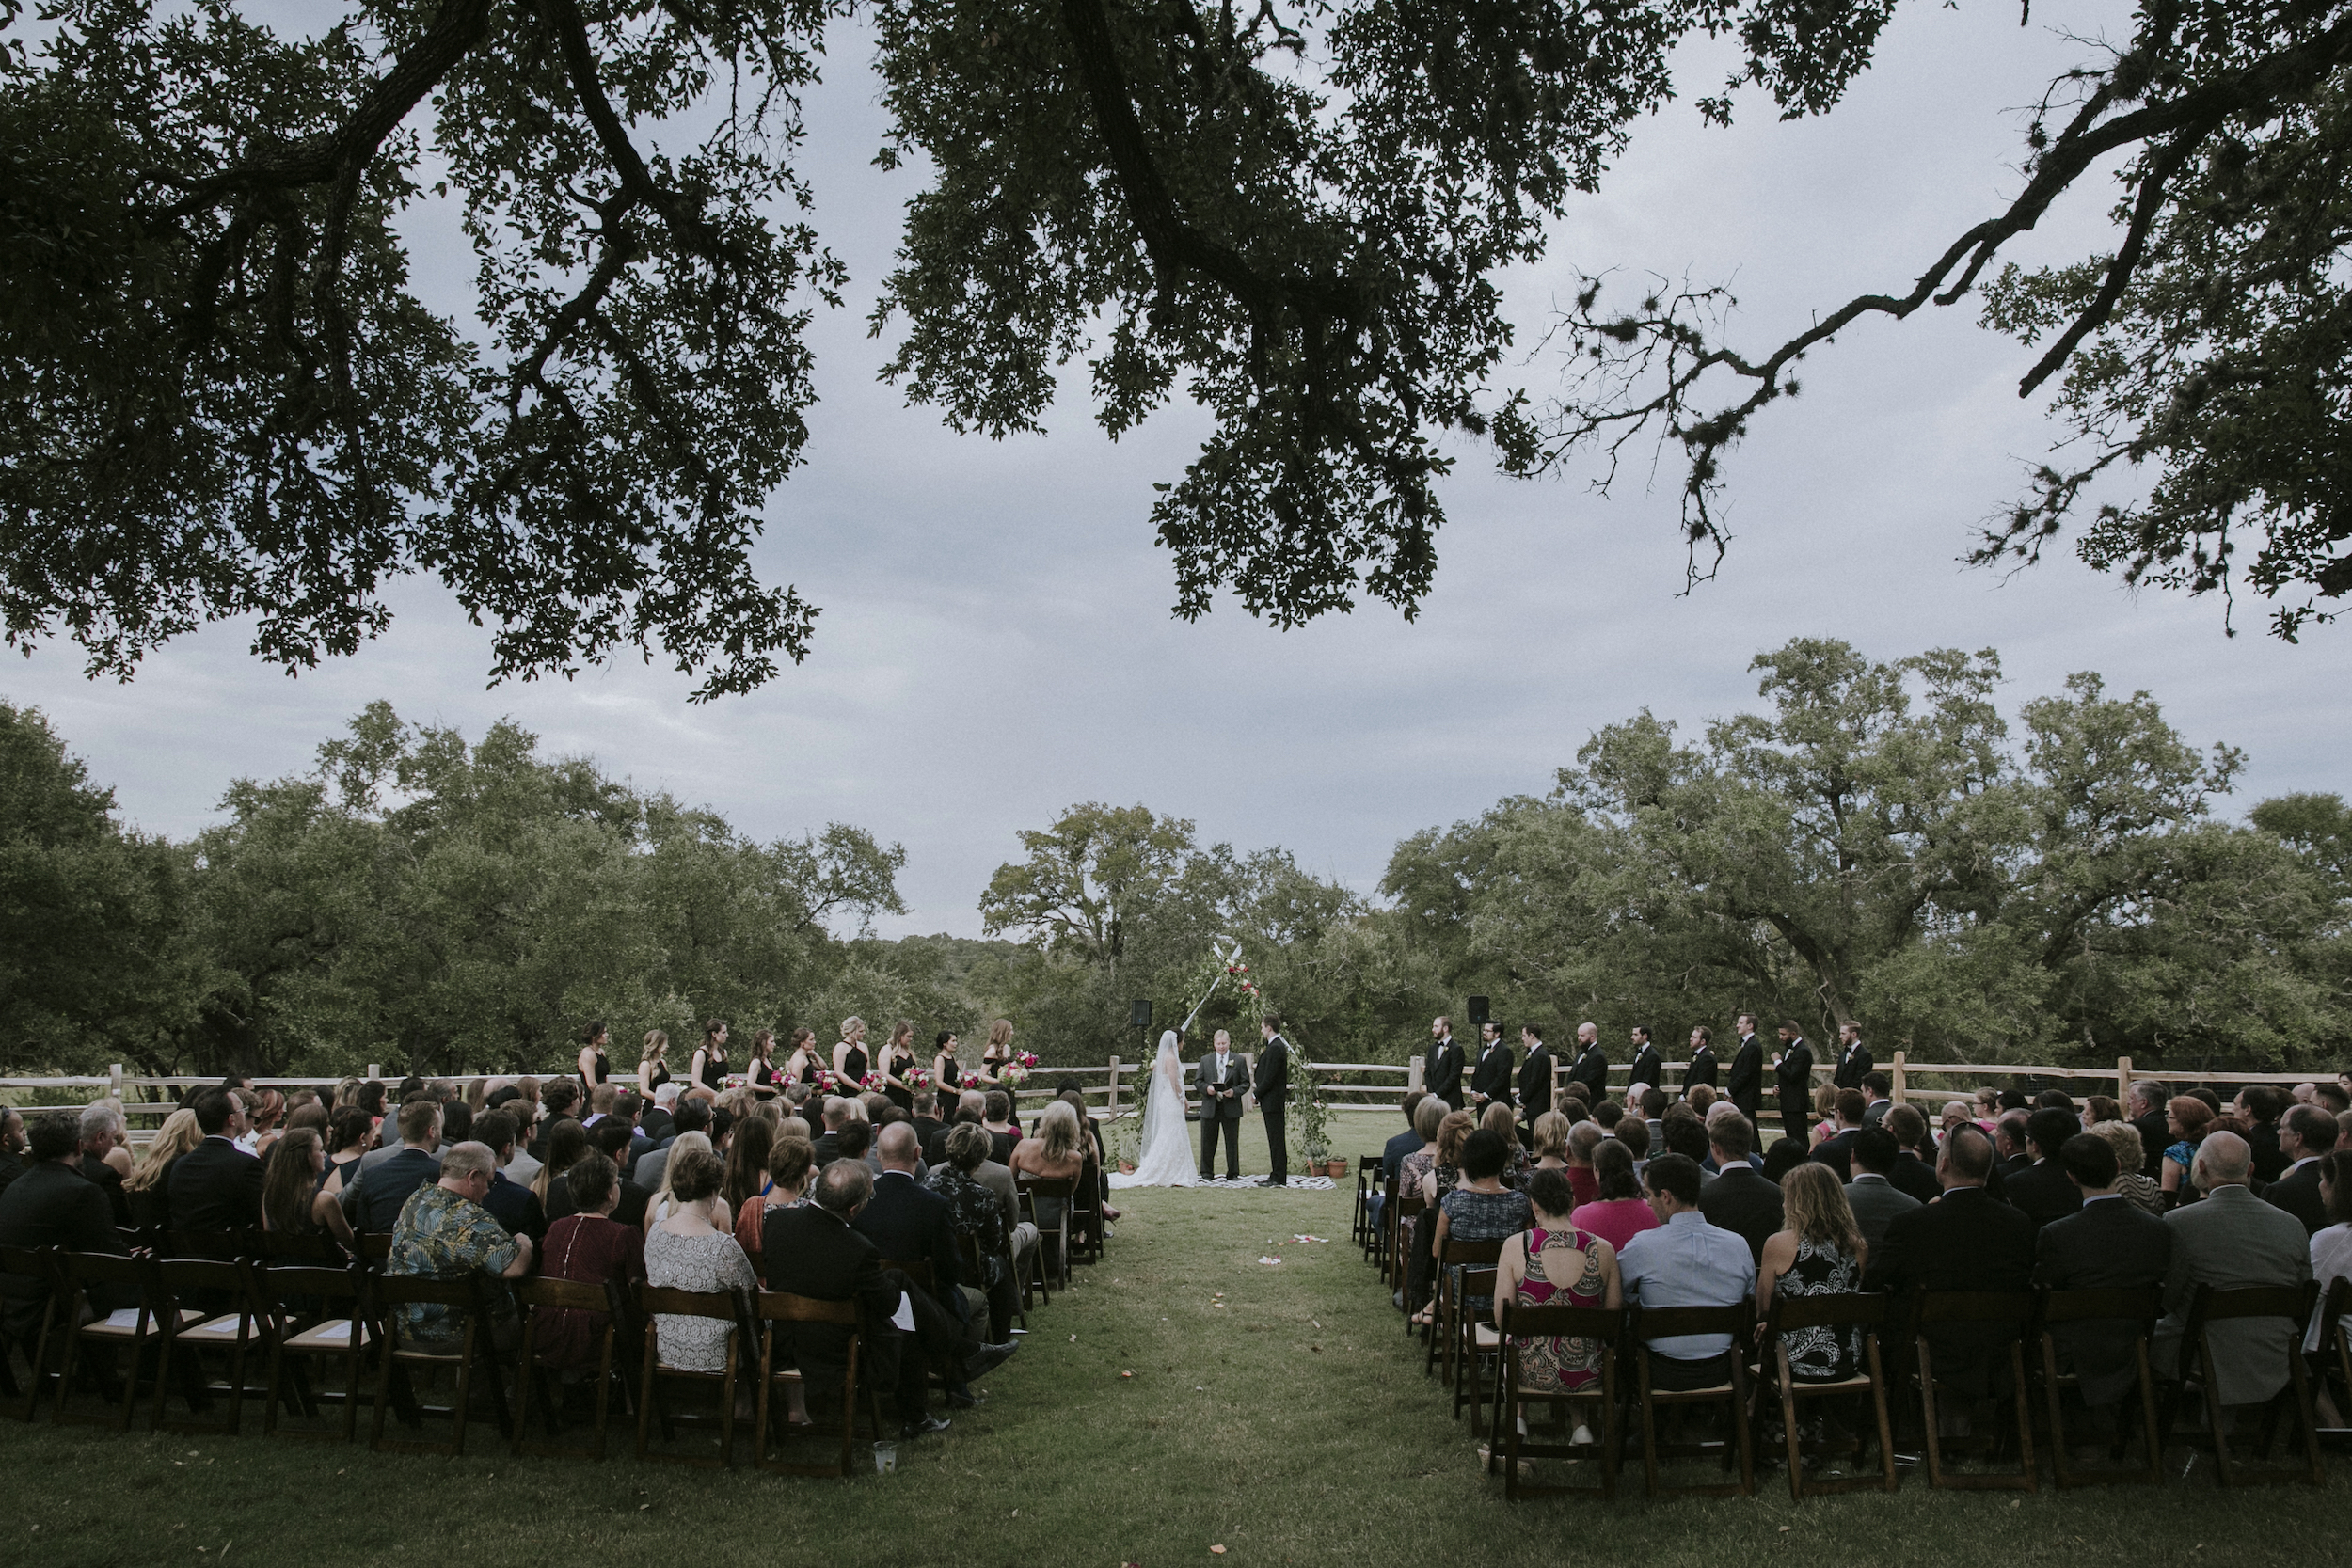 Garden Grove Wedding & Event Center5710.JPG